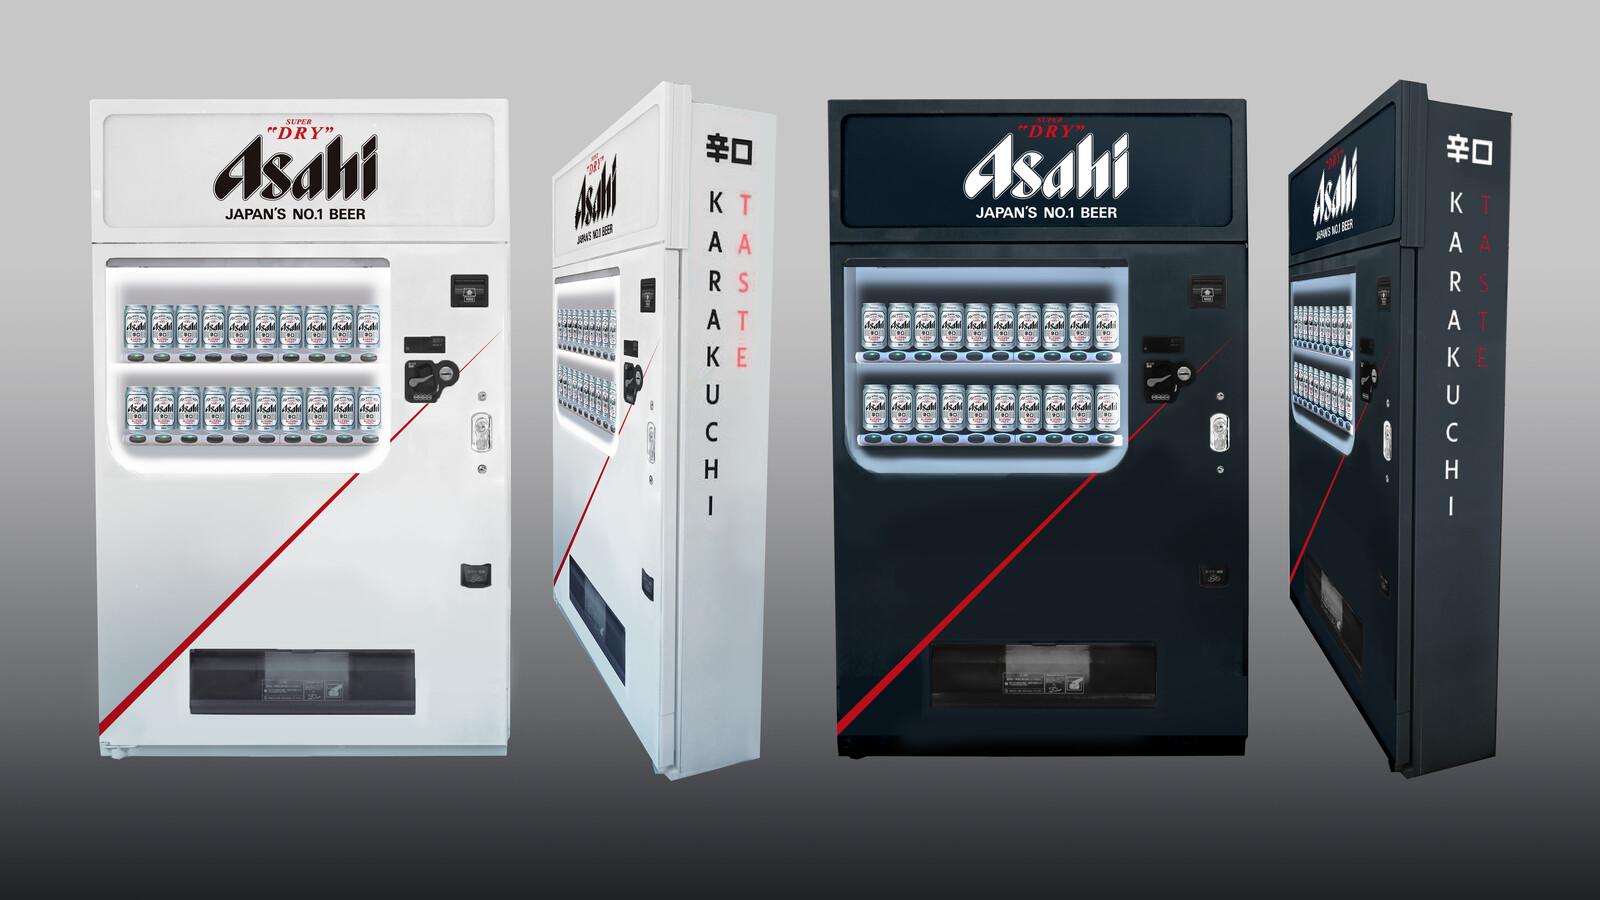 Asahi vending machine